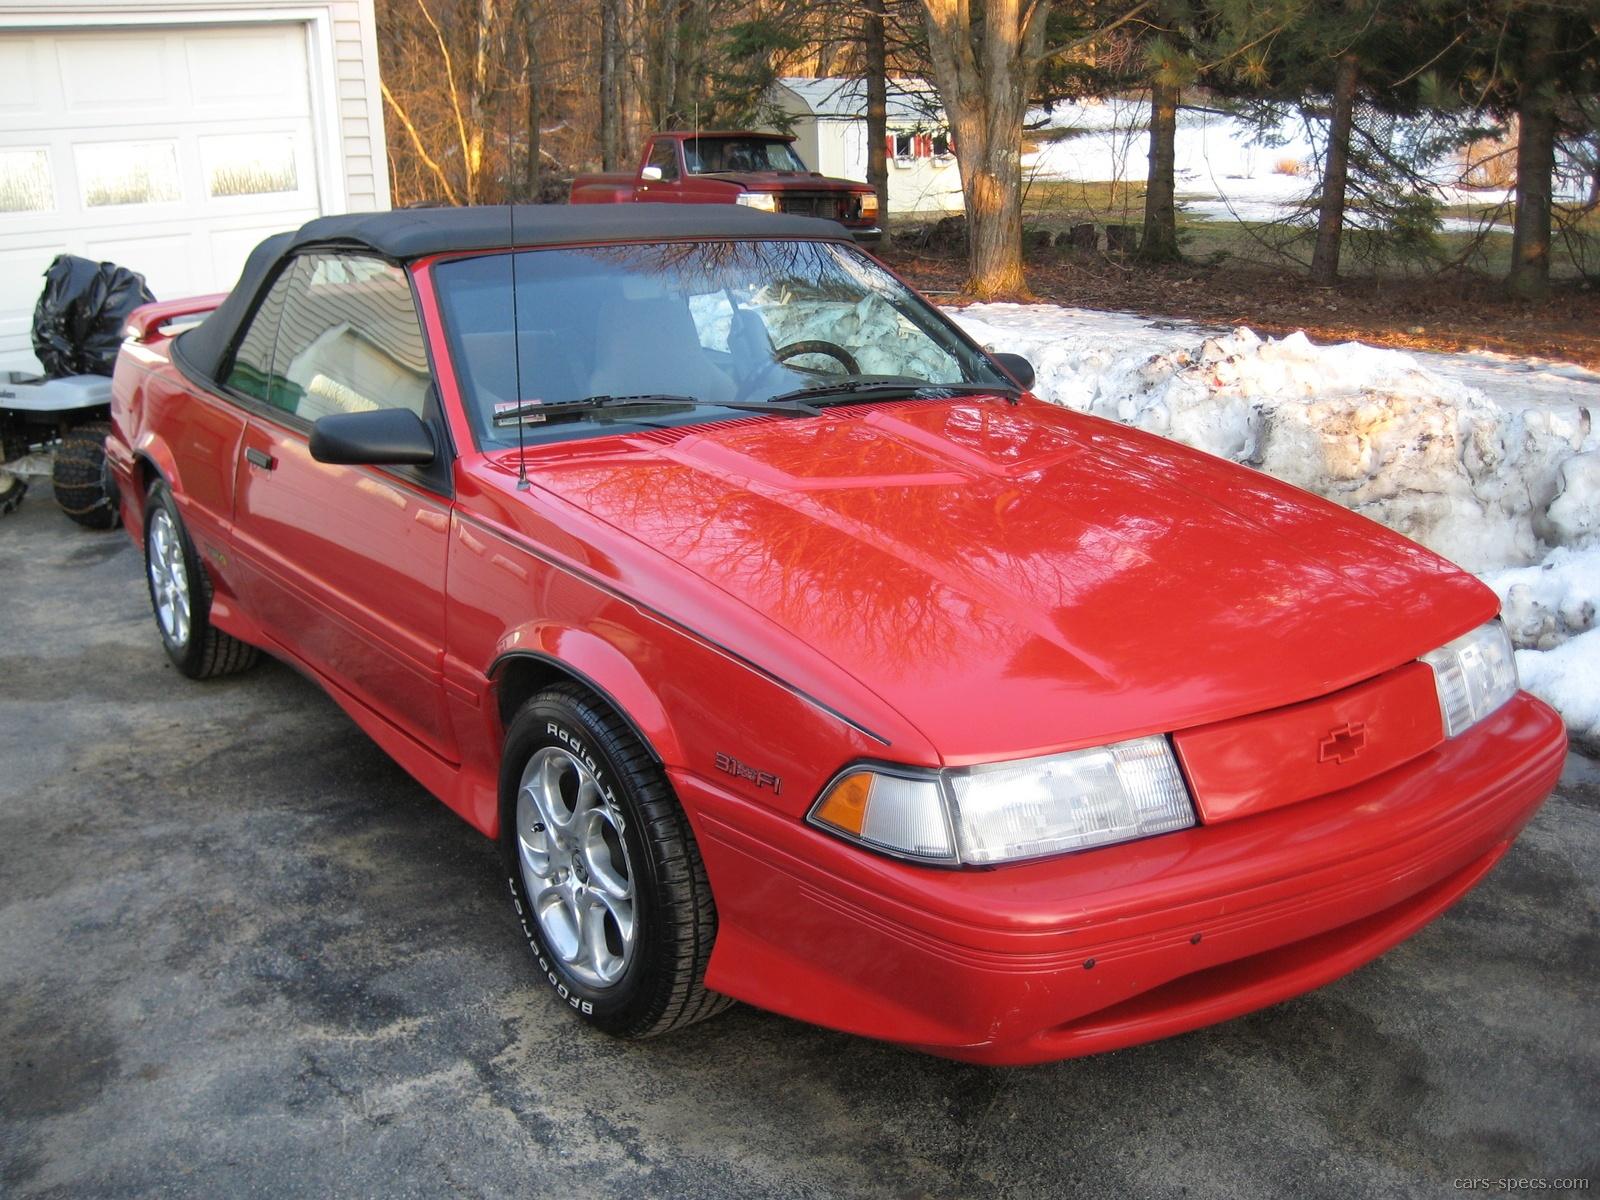 Robs 1990 Chevrolet Cavalier z24